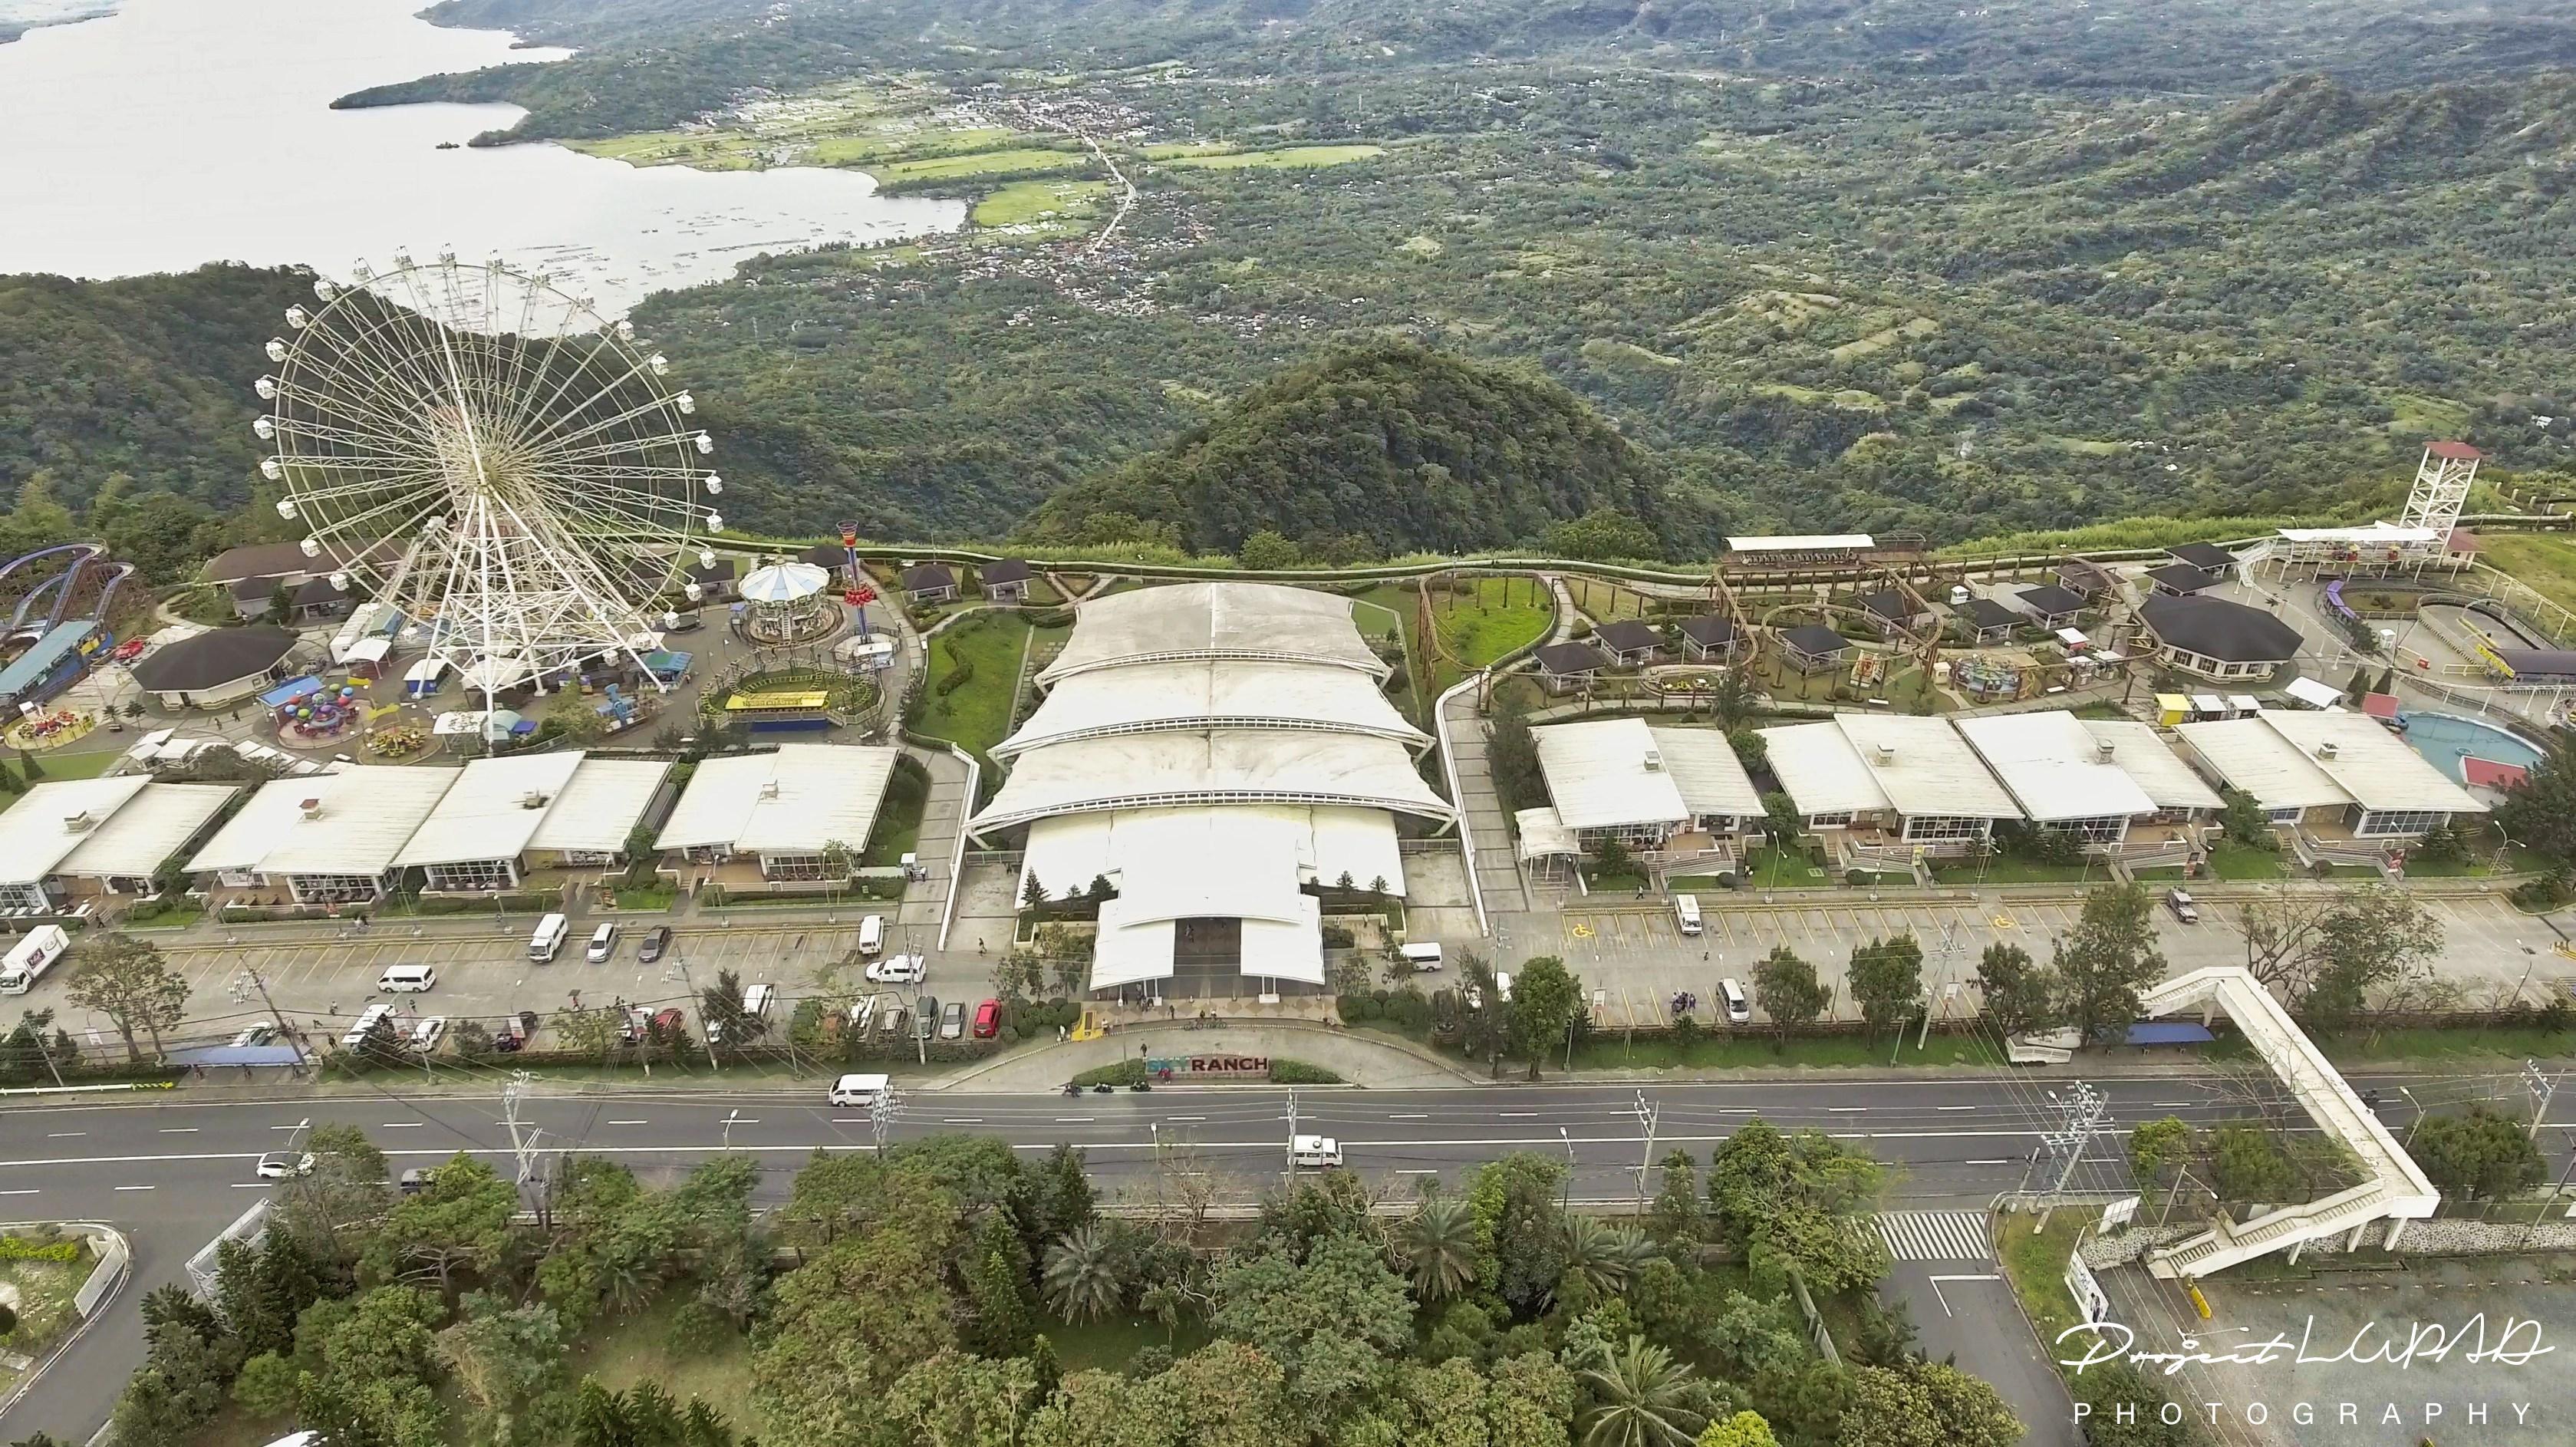 PHOTOS: Sky Ranch Amusement Park Aerial View